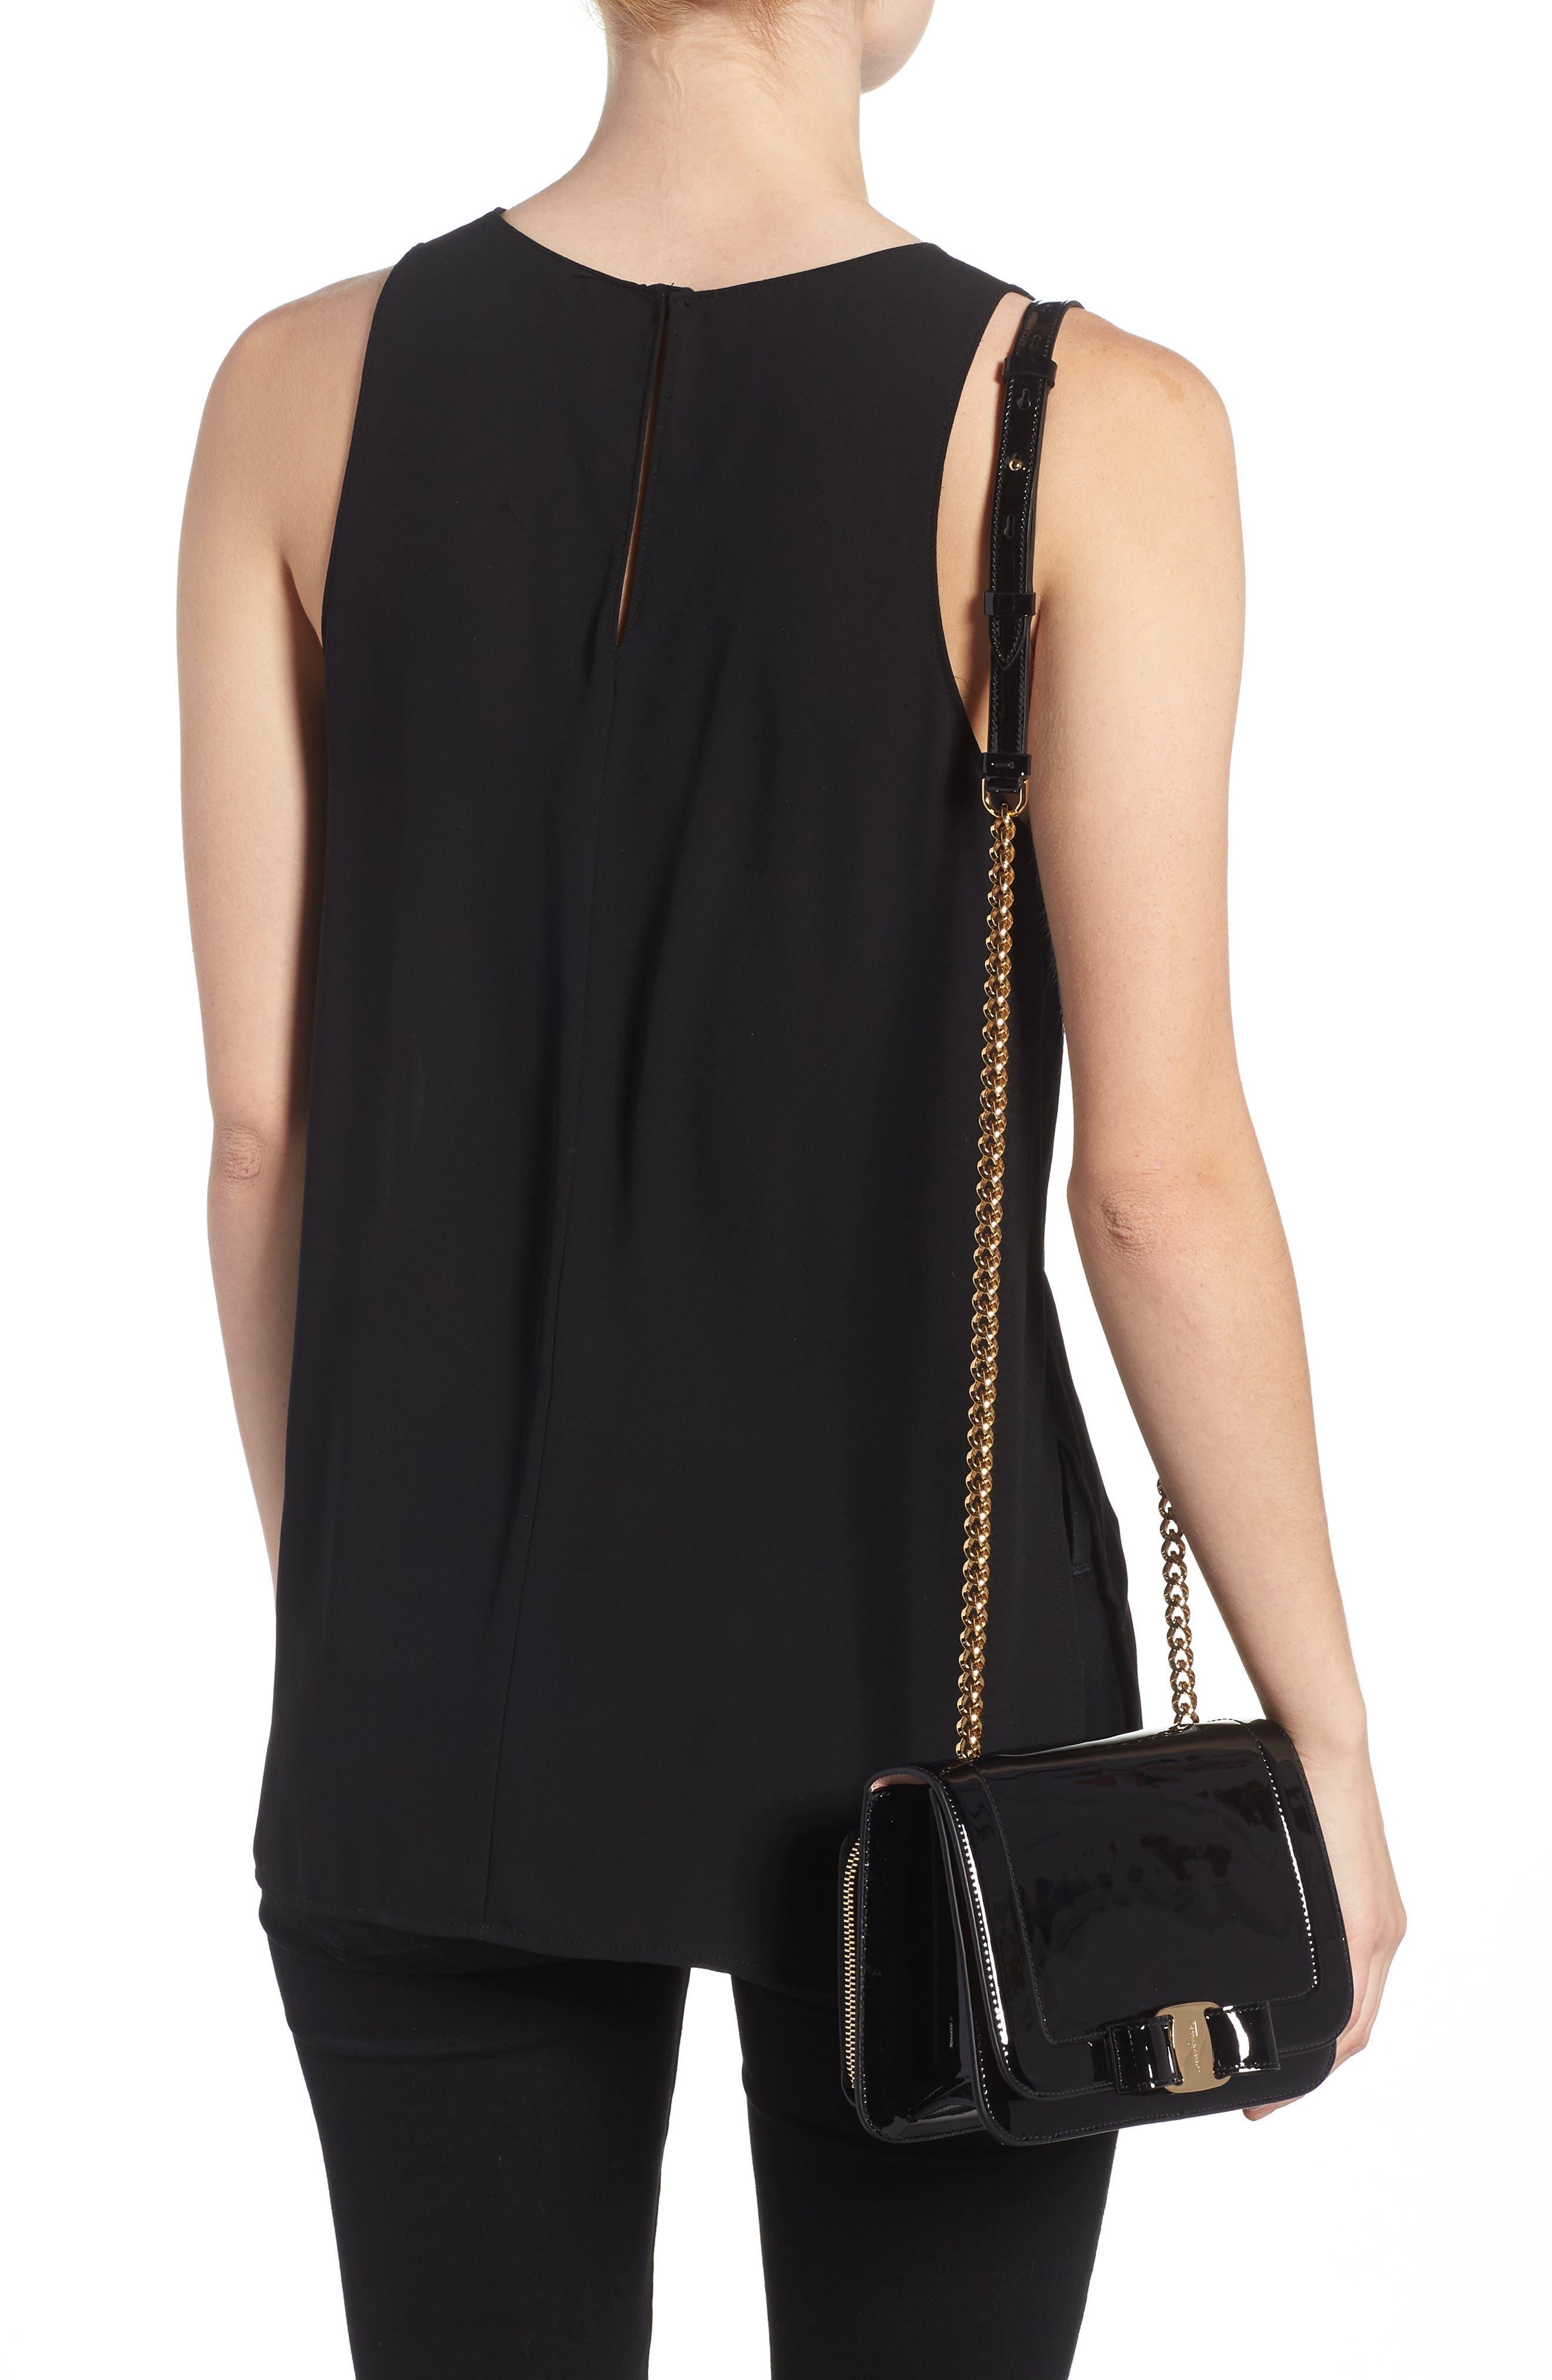 Vara Patent Leather Shoulder Bag,                             Alternate thumbnail 2, color,                             NERO/ BONBON